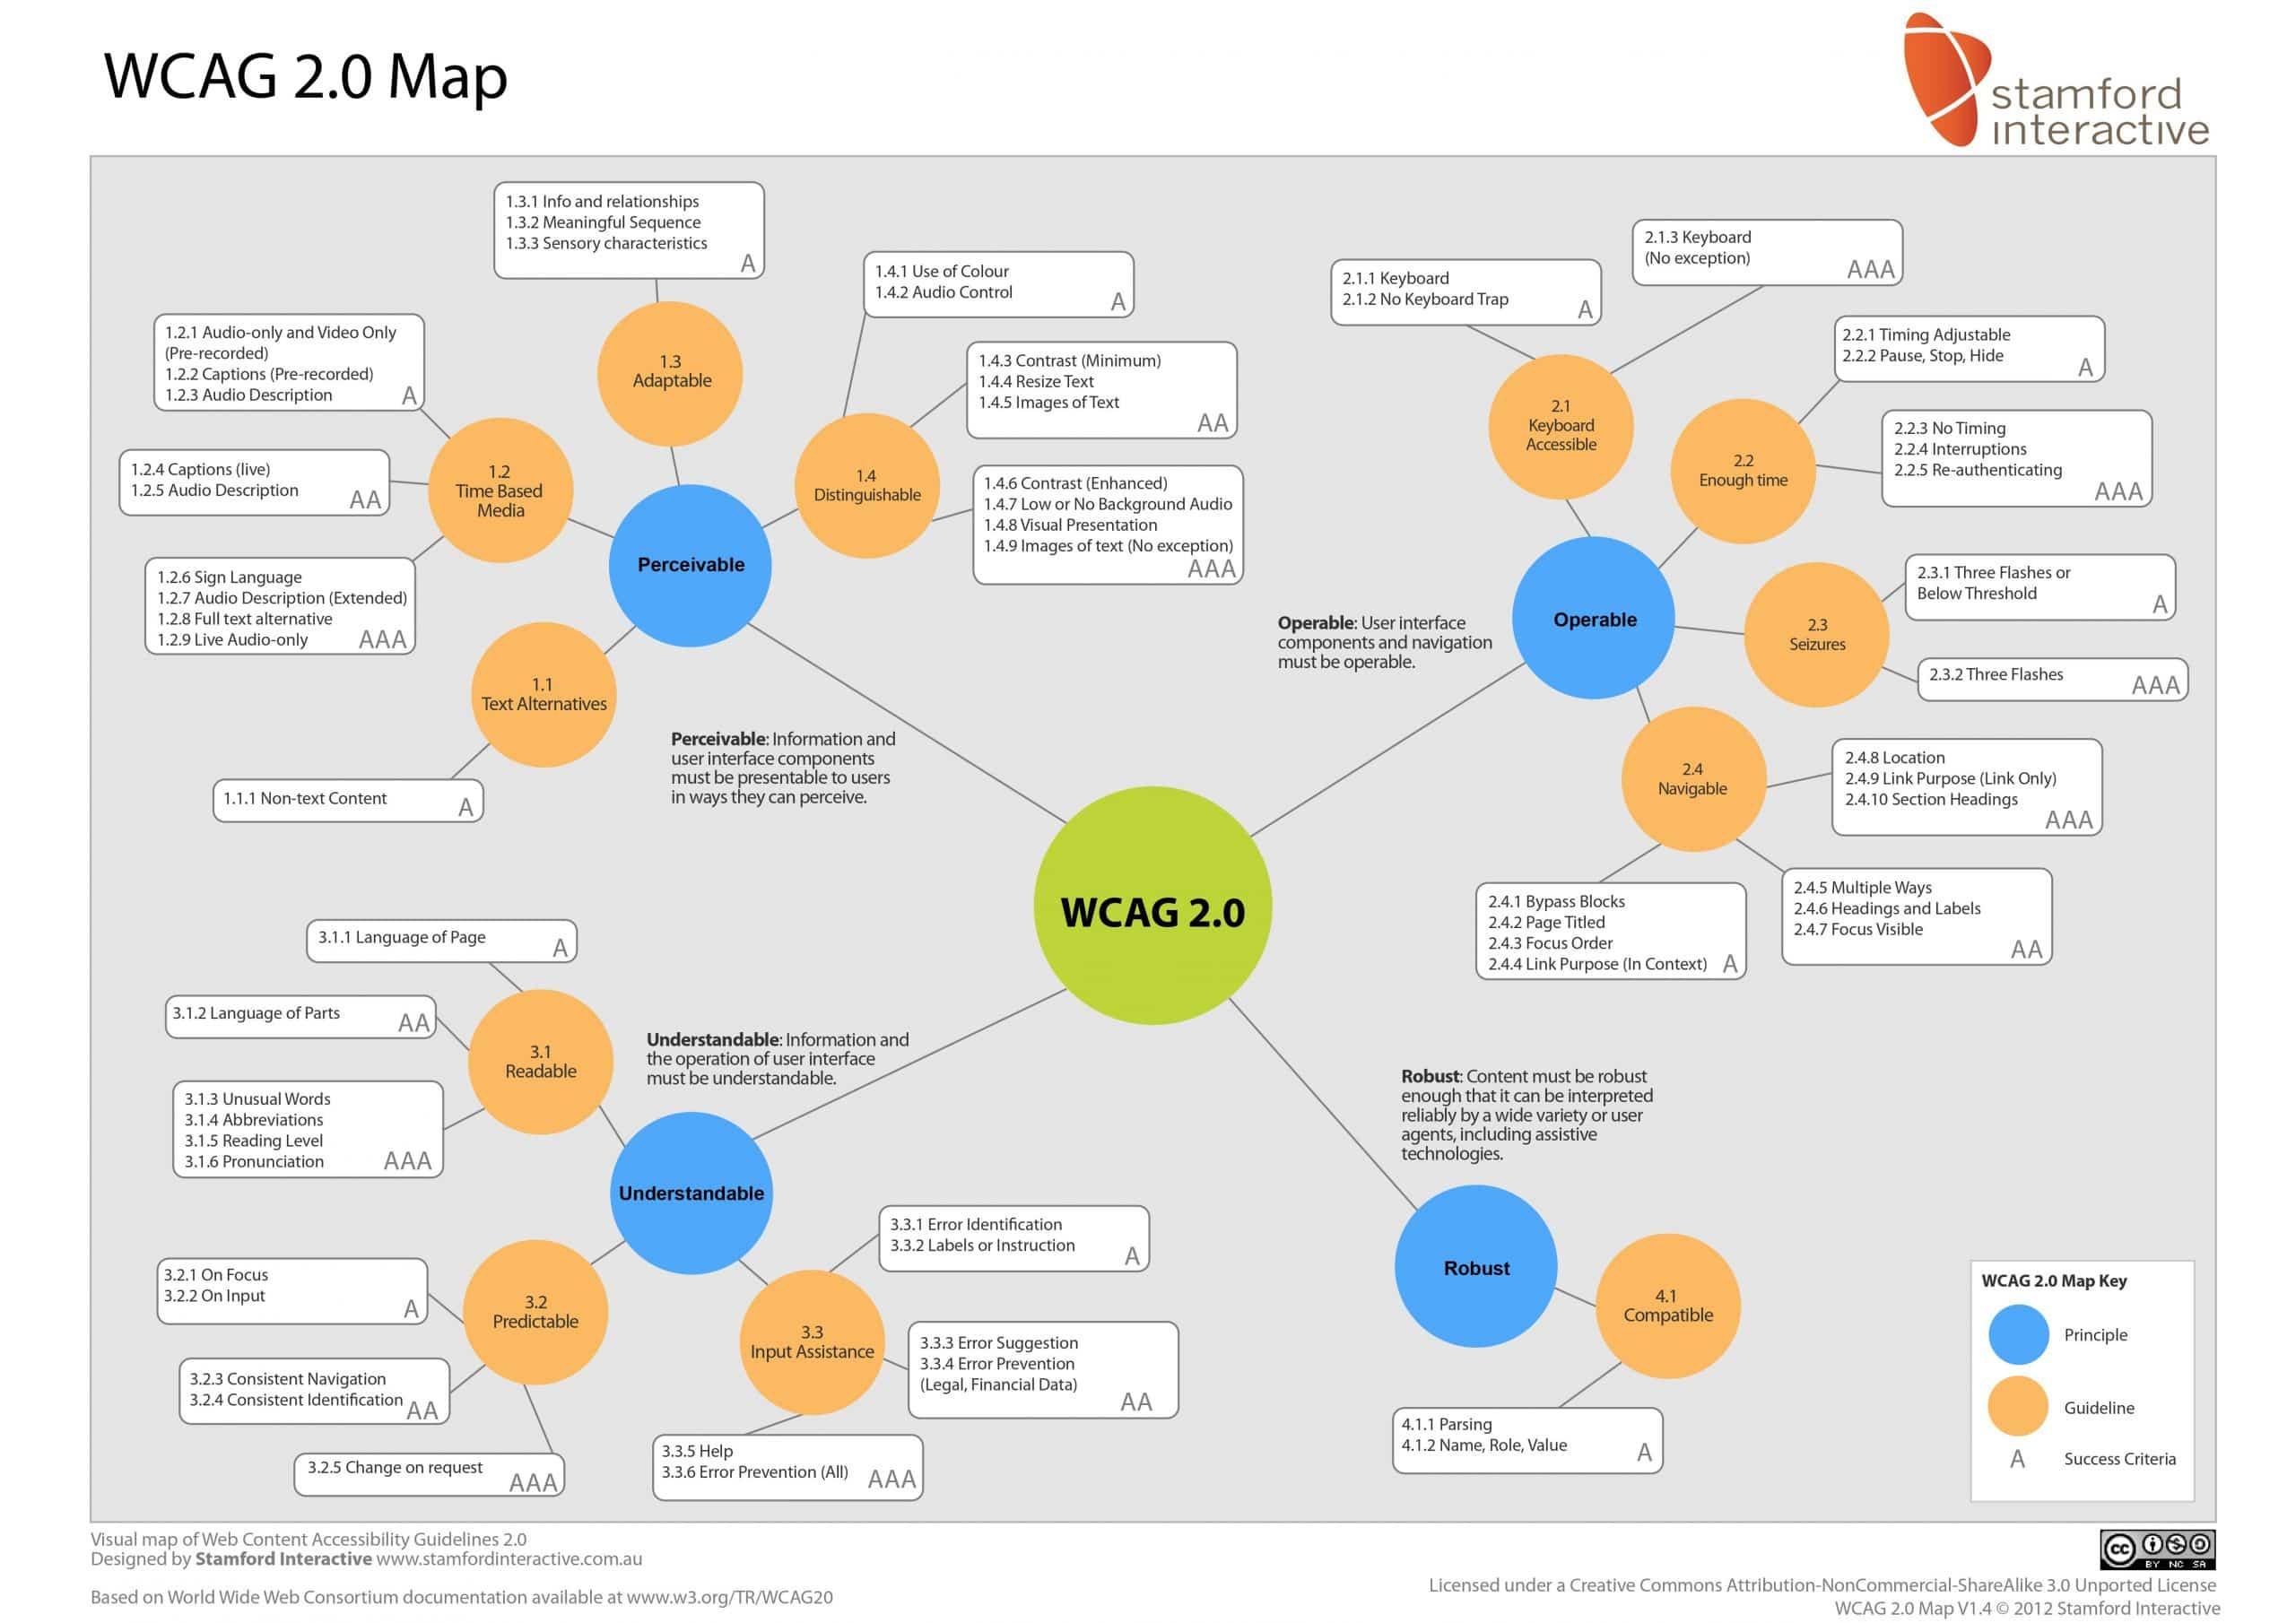 WCAG MAP 2